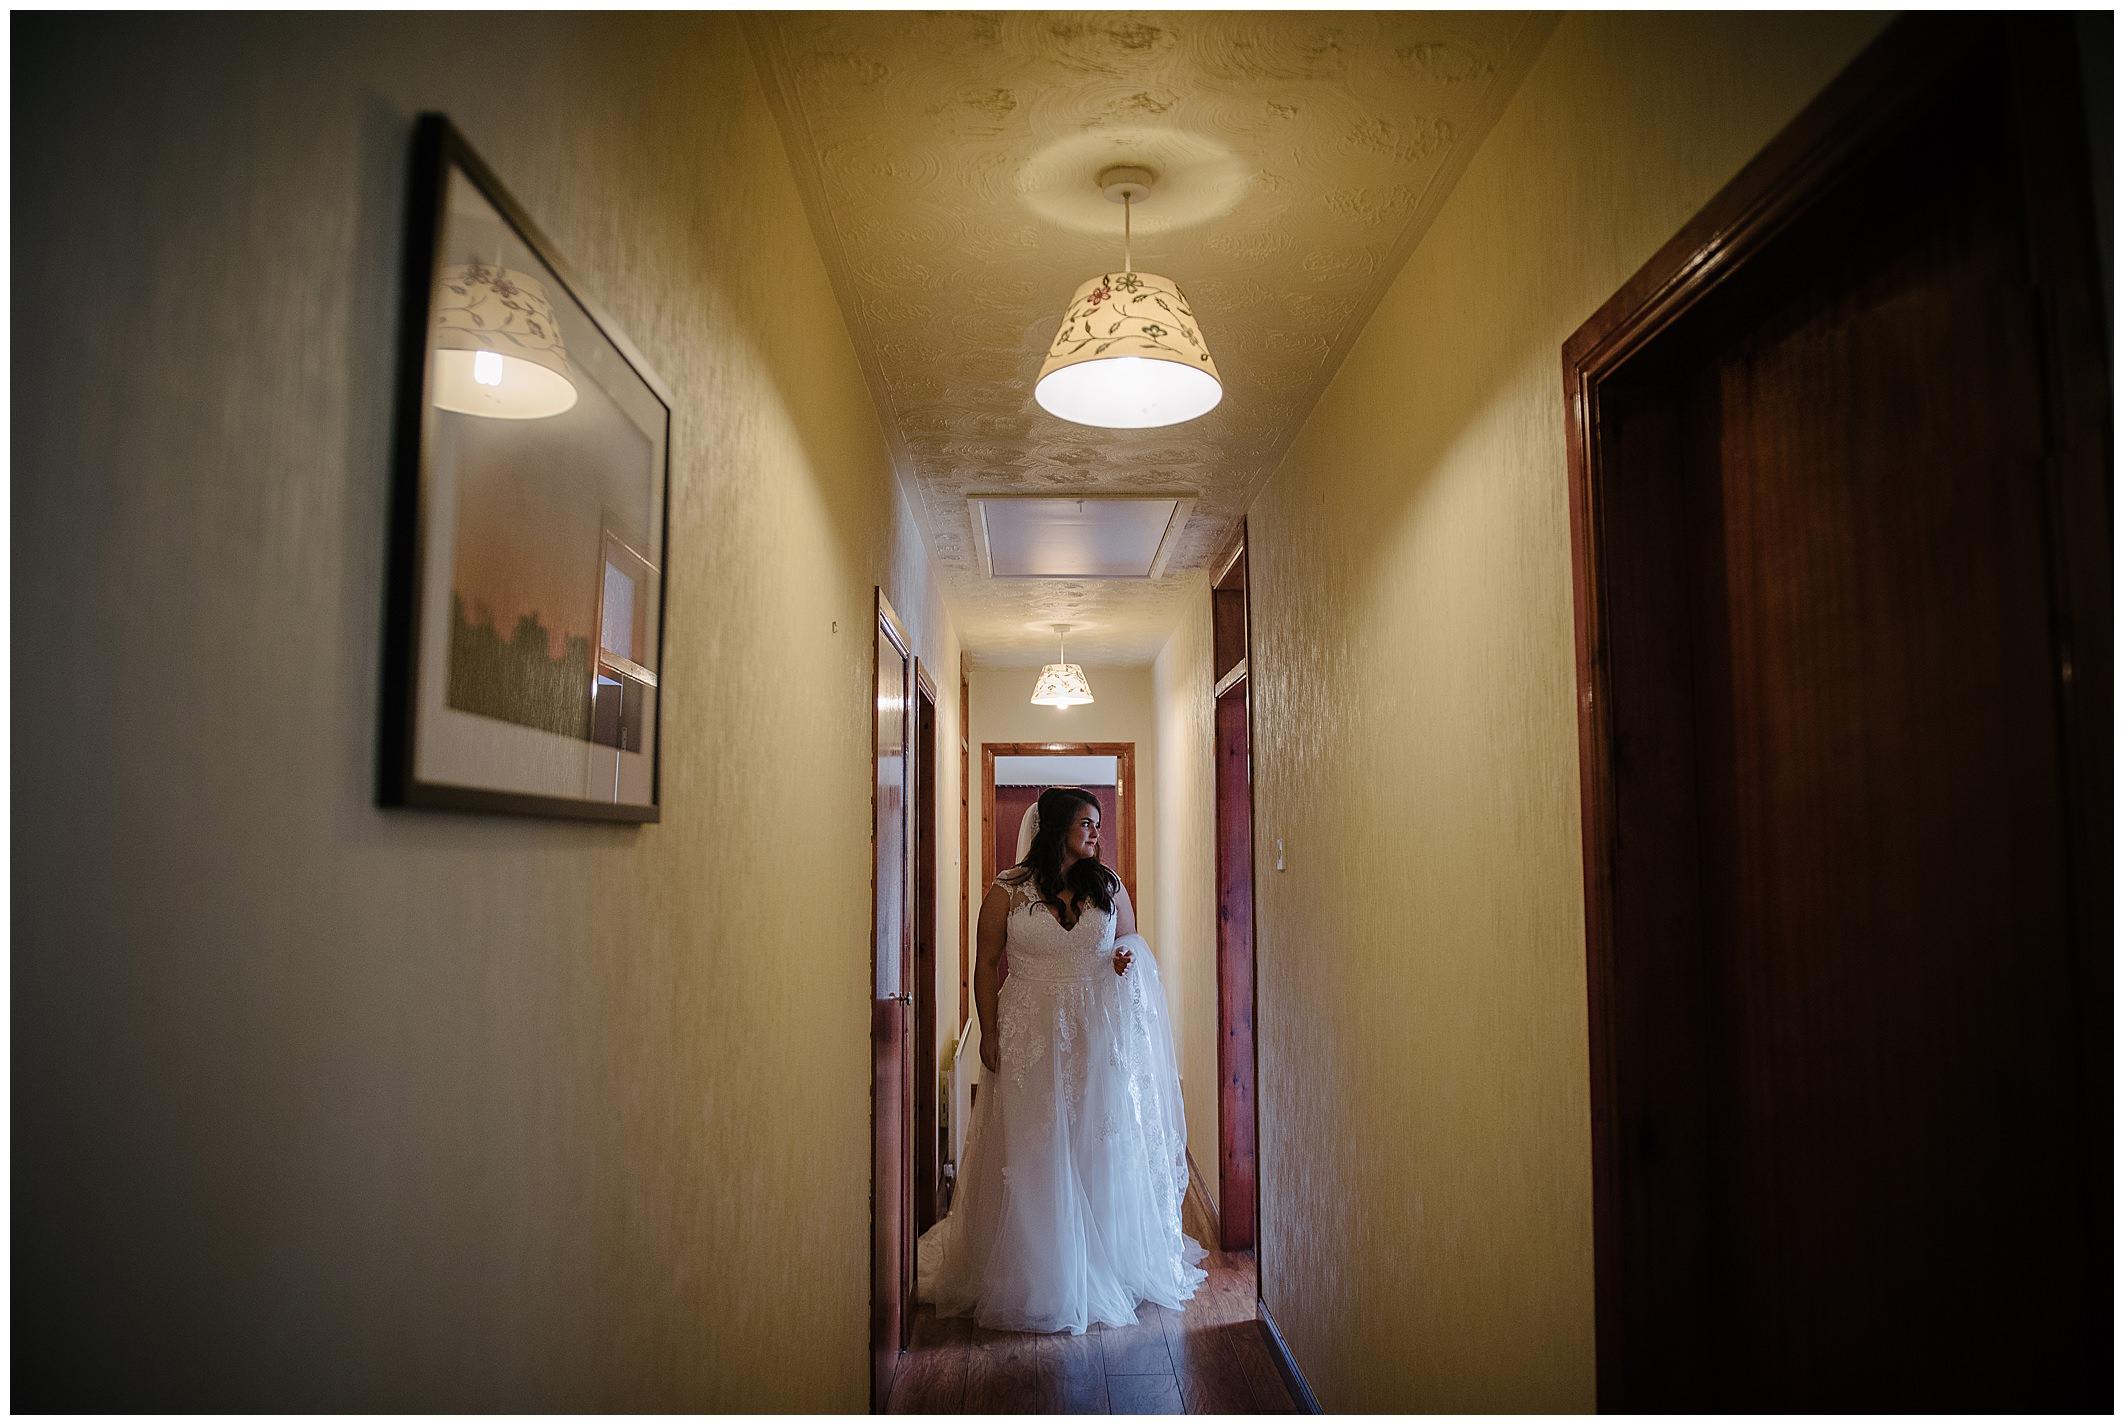 redcastle-hotel-wedding-karen-brian-jude-browne-photography-021.jpg